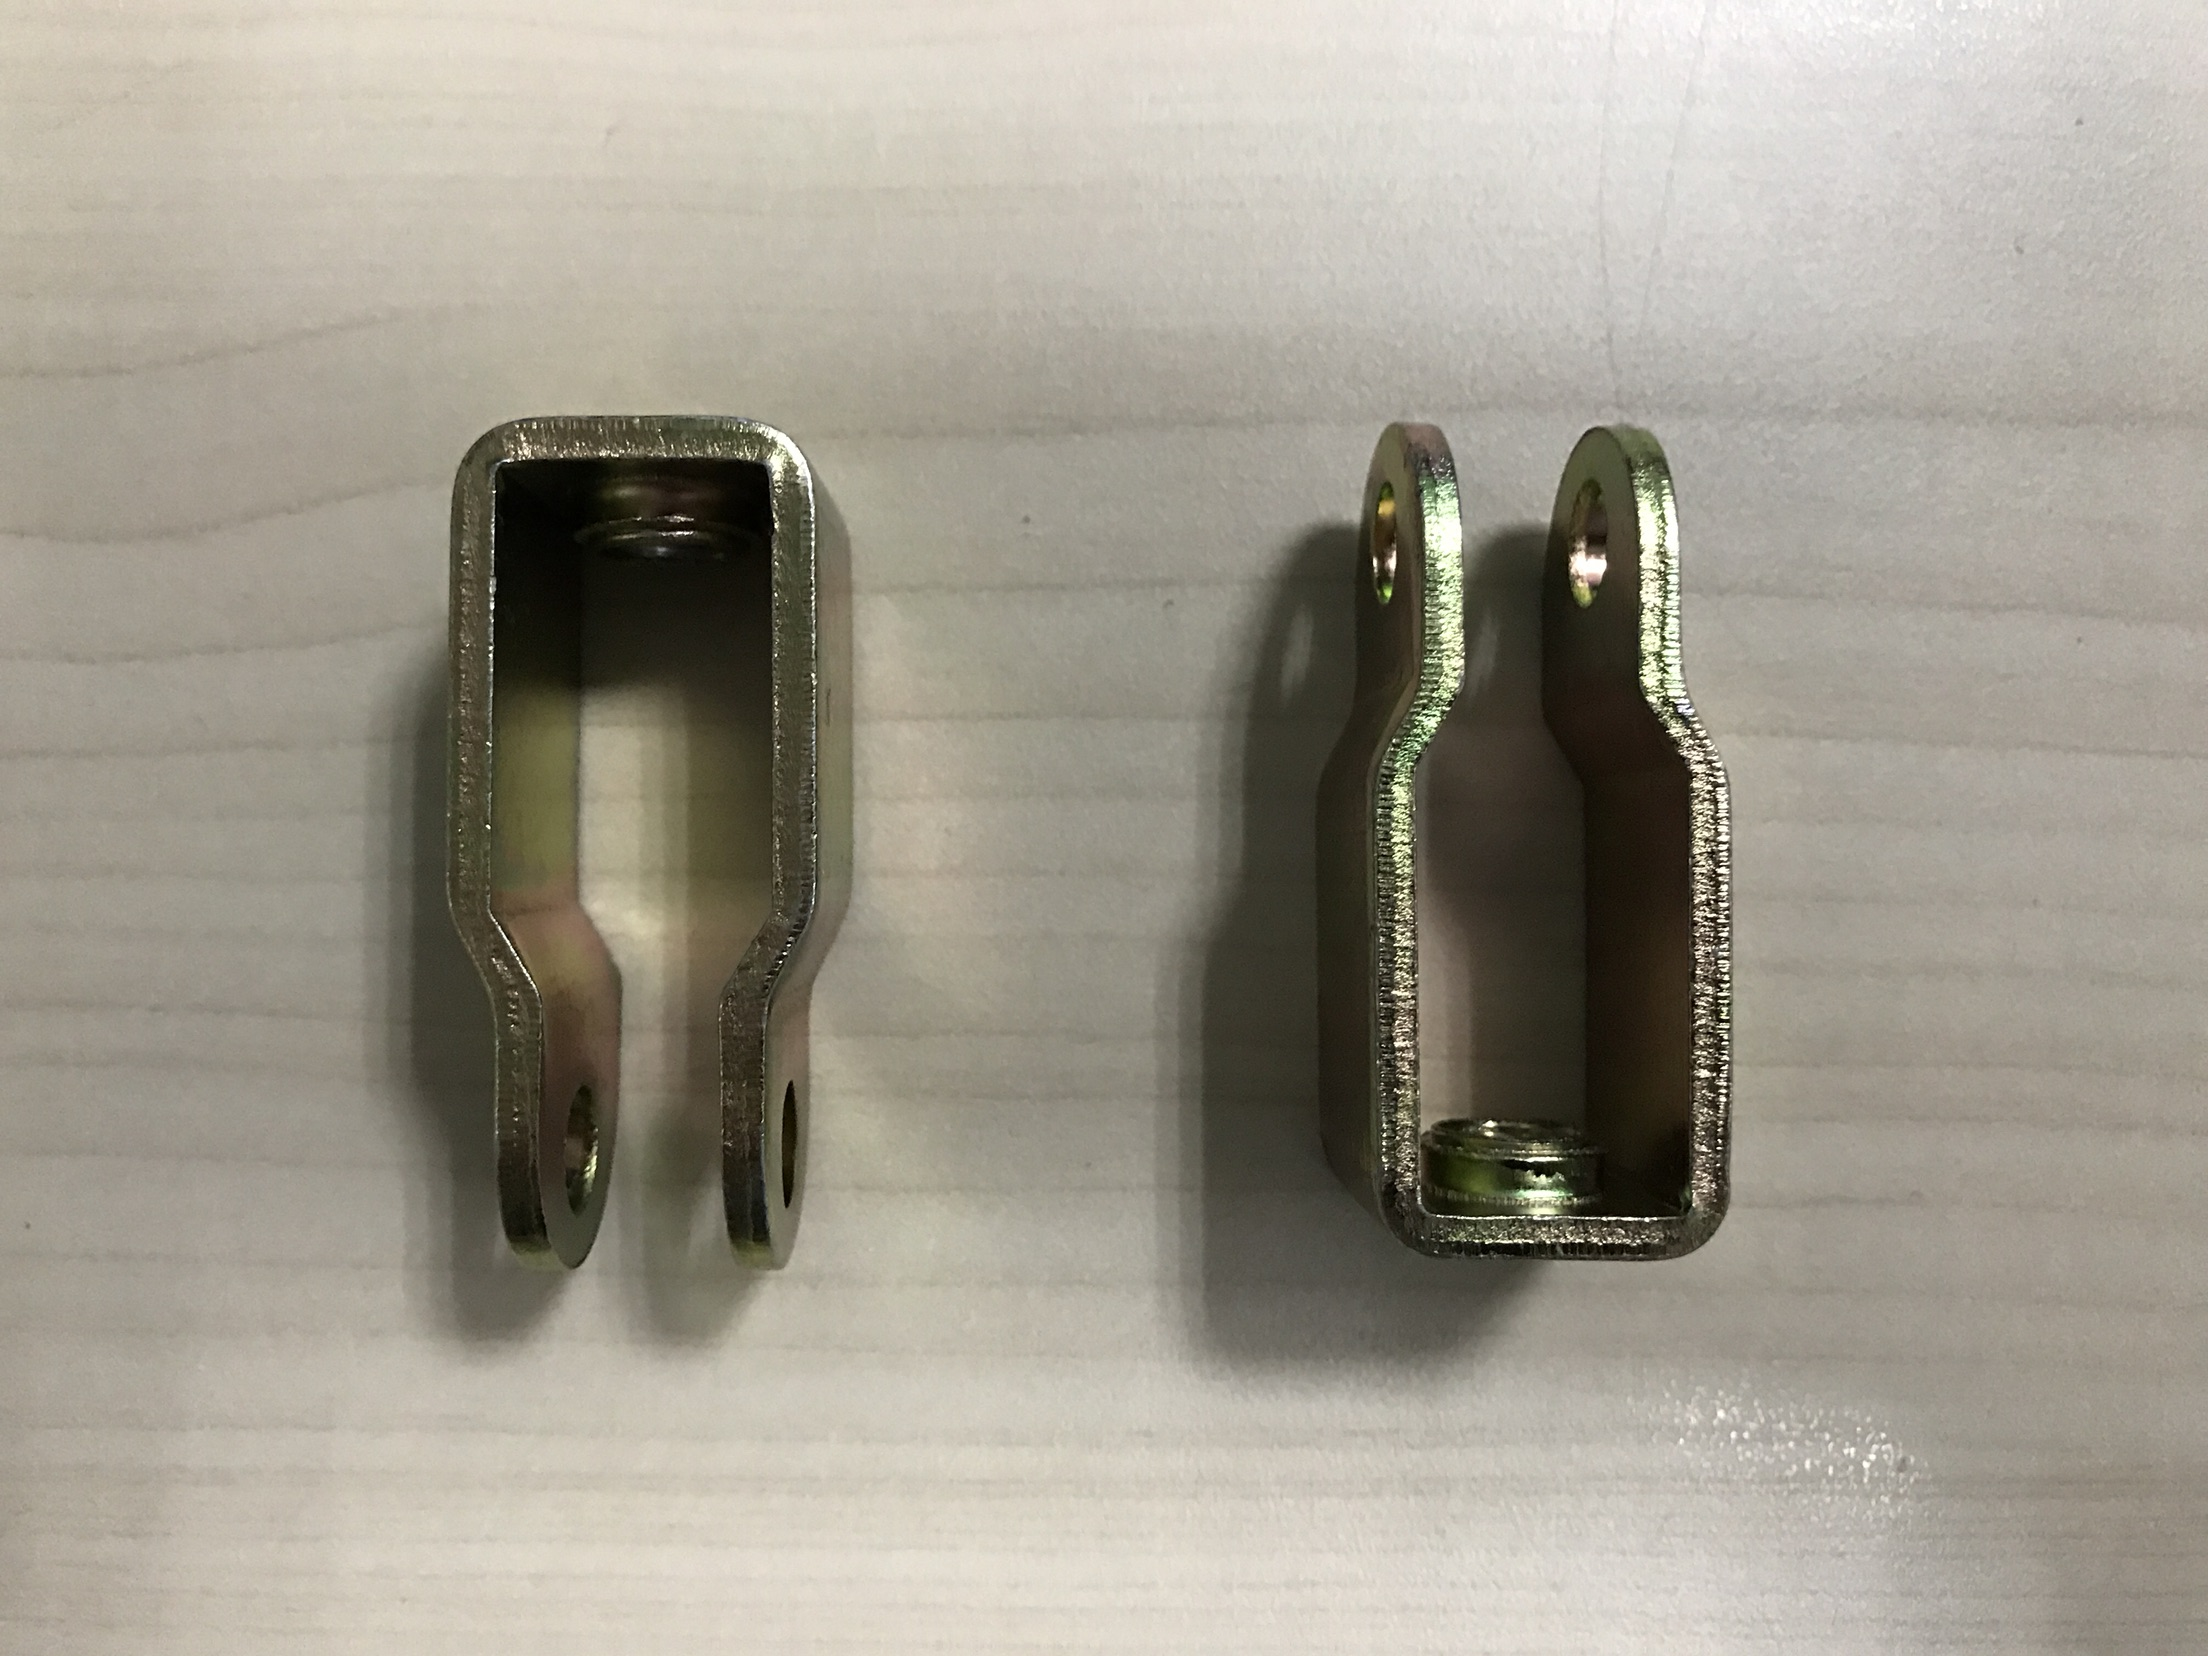 k1 - caldwell vakuum booster med rod huvudcylindern.